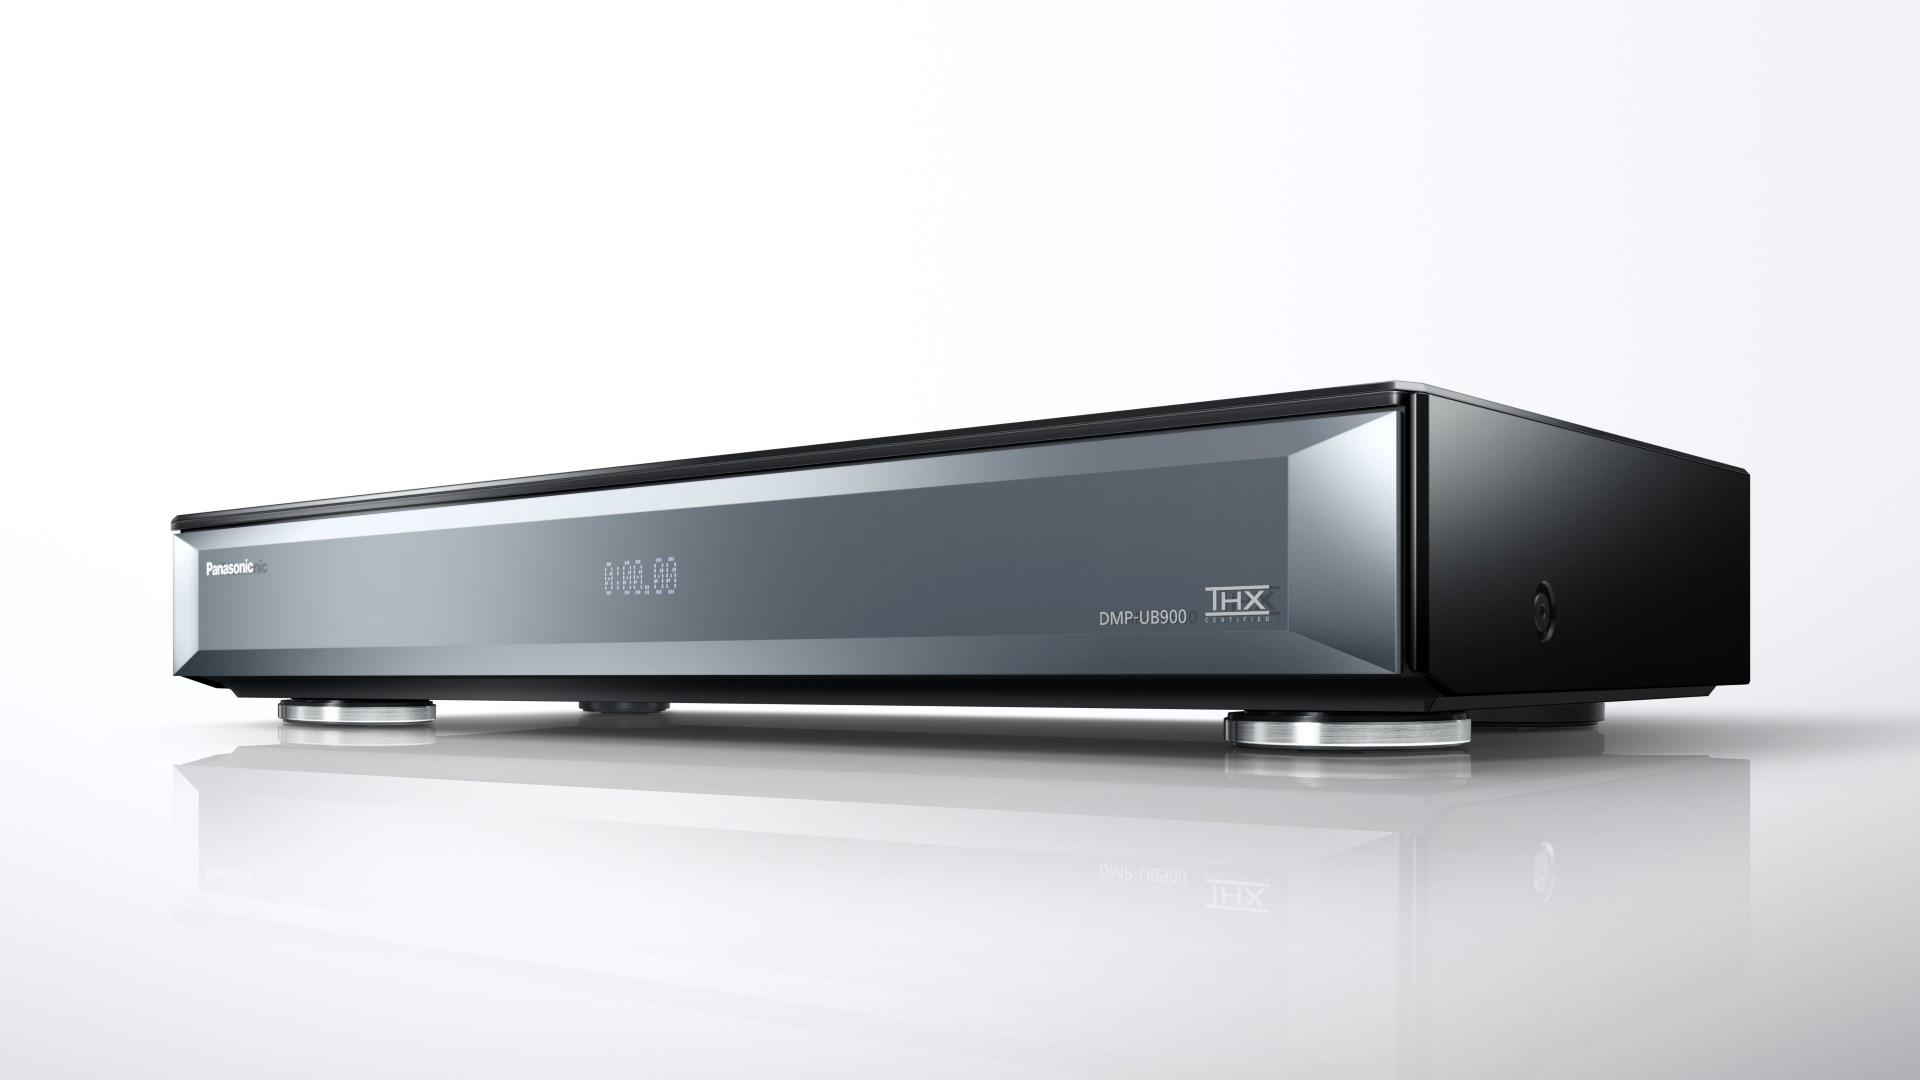 Test HCFR du Panasonic DMP-UB900, lecteur Bluray UHD